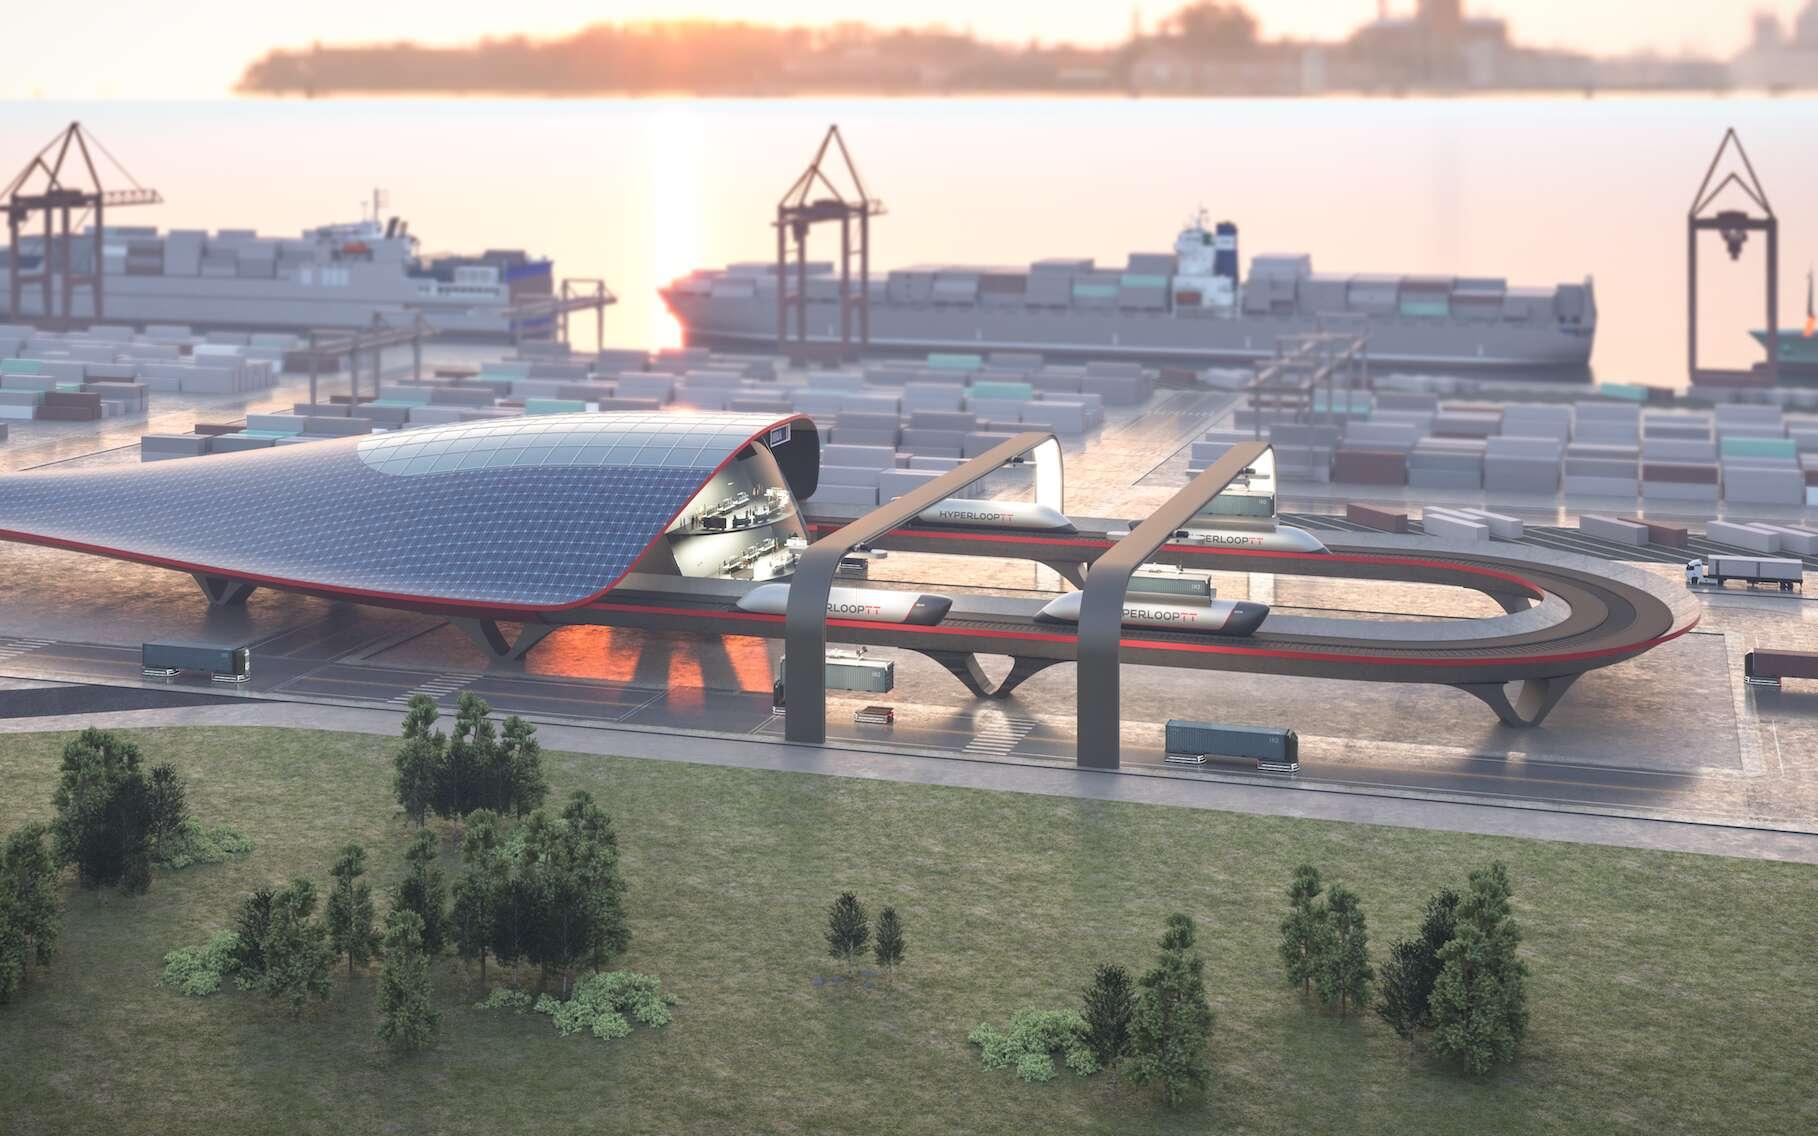 L'HyperPort développé par Hyperloop TT veut révolutionner le transport de fret. © Hyperloop TT